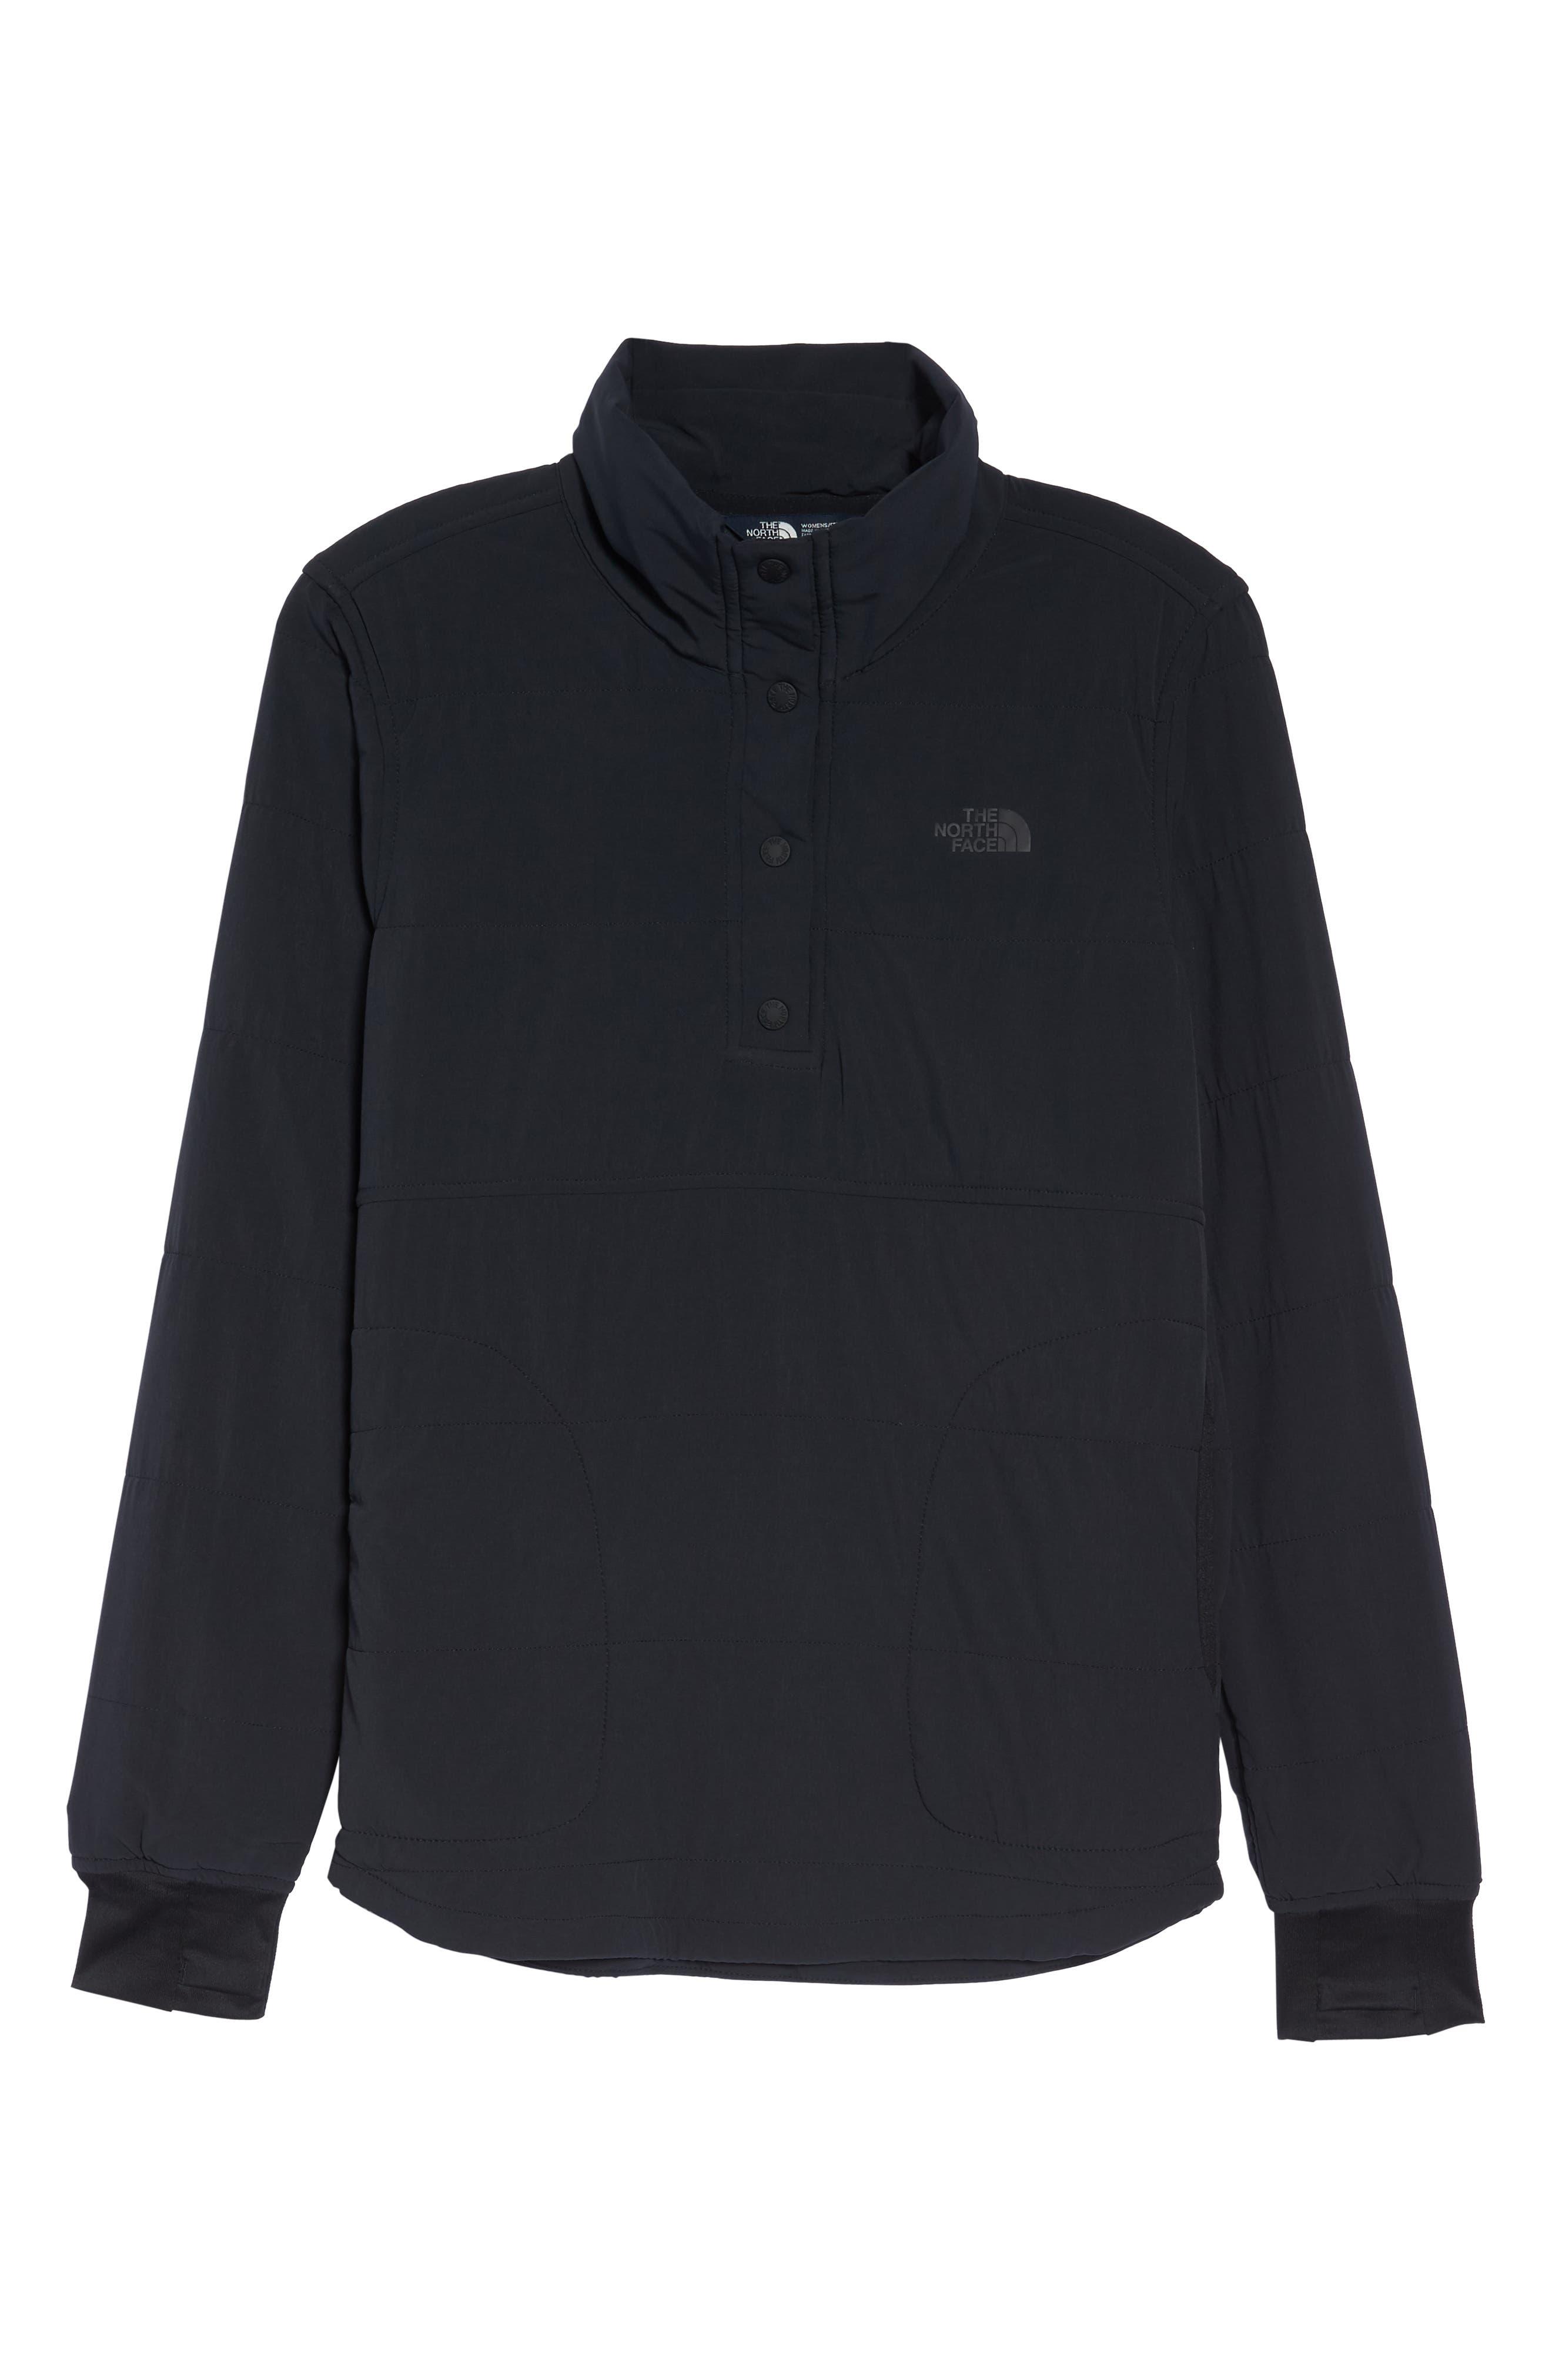 Mountain Snap Neck Sweatshirt,                             Alternate thumbnail 7, color,                             001